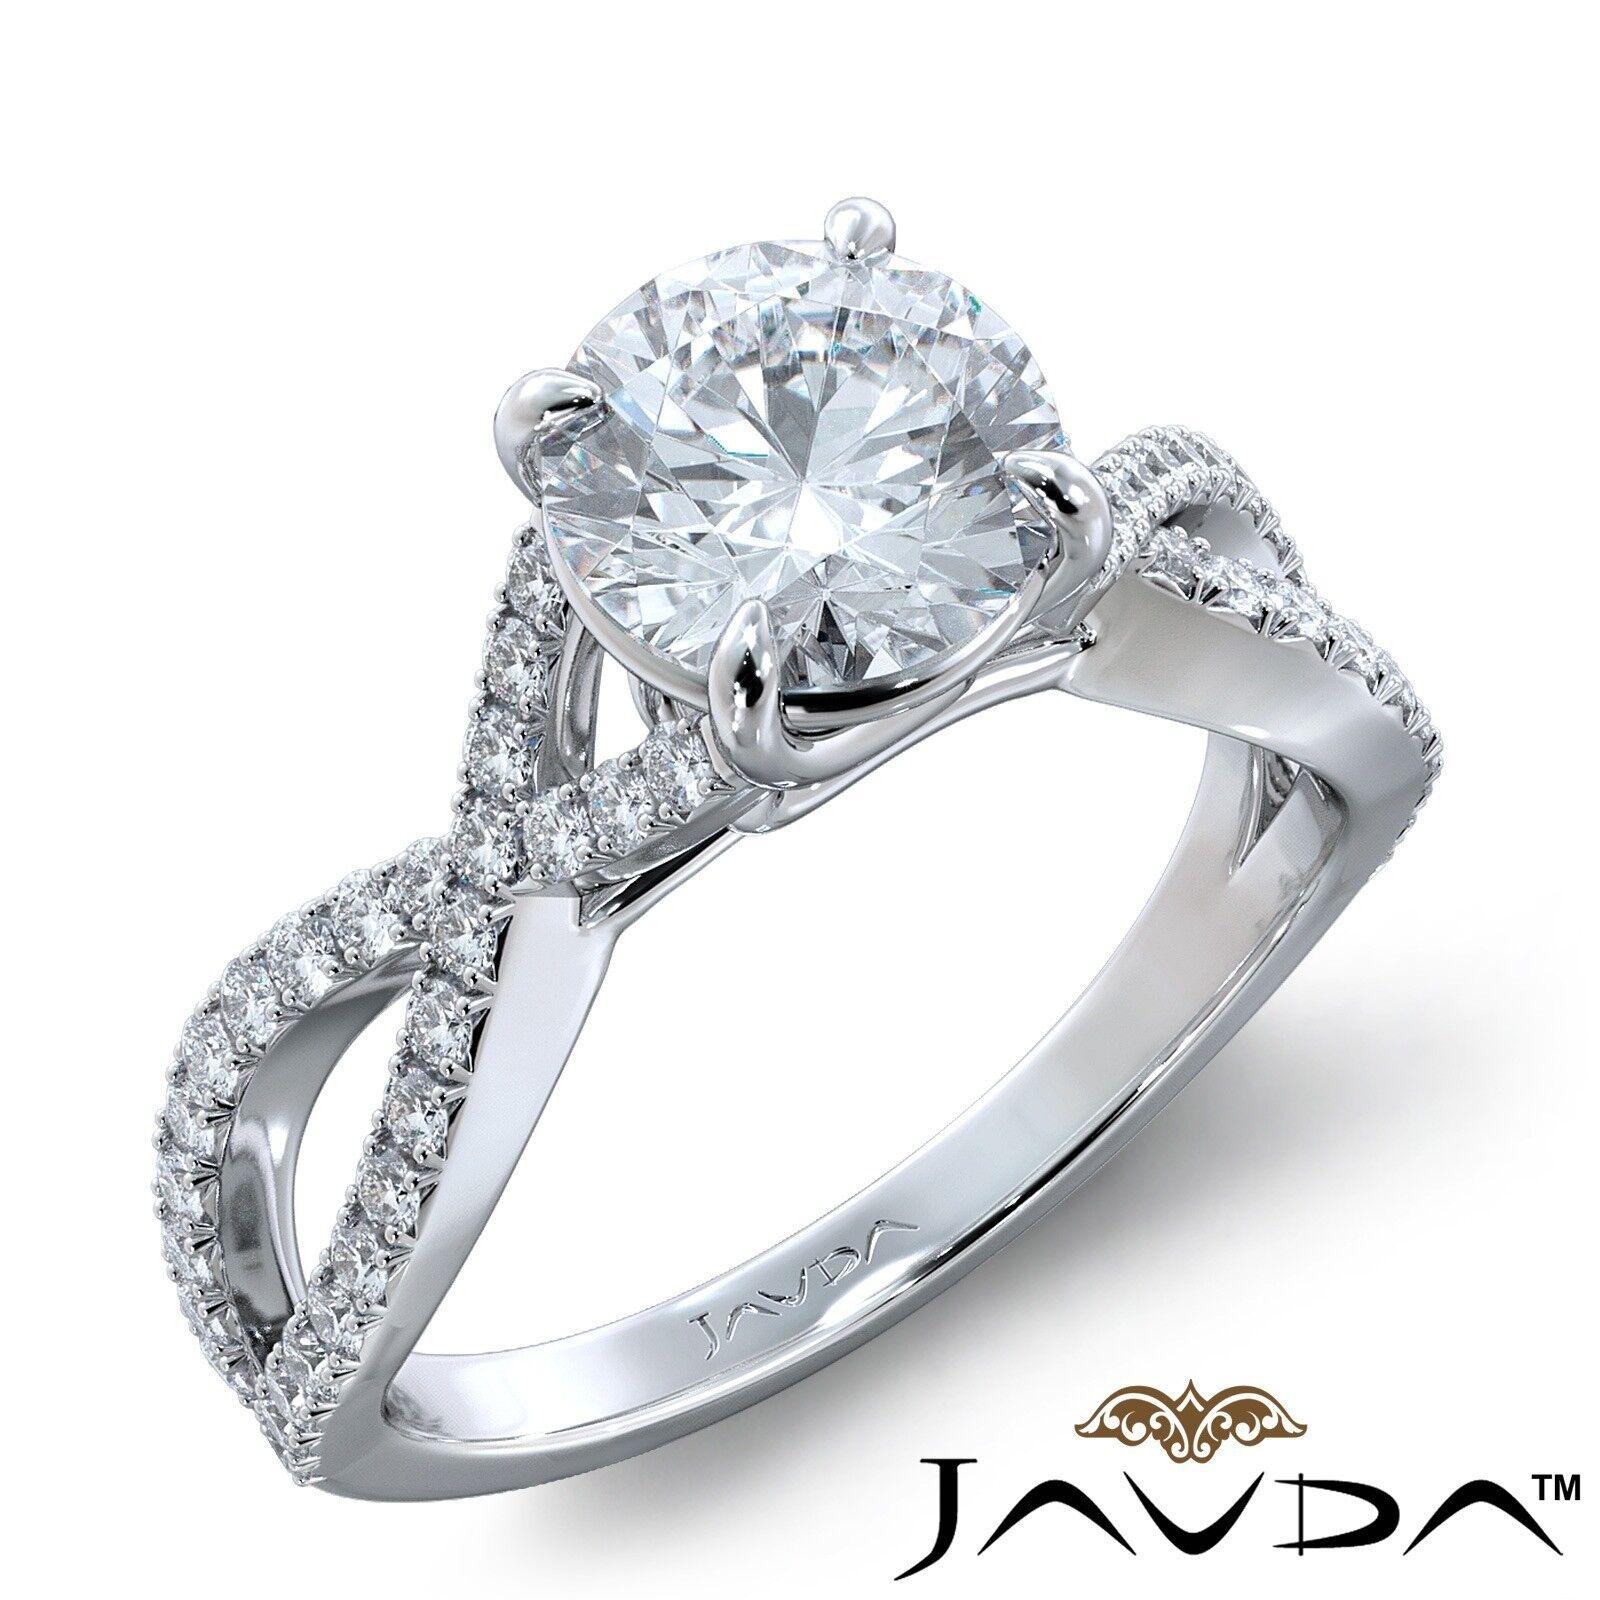 2.15ct French Pave Sidestone Round Diamond Engagement Ring GIA E-VVS1 White Gold